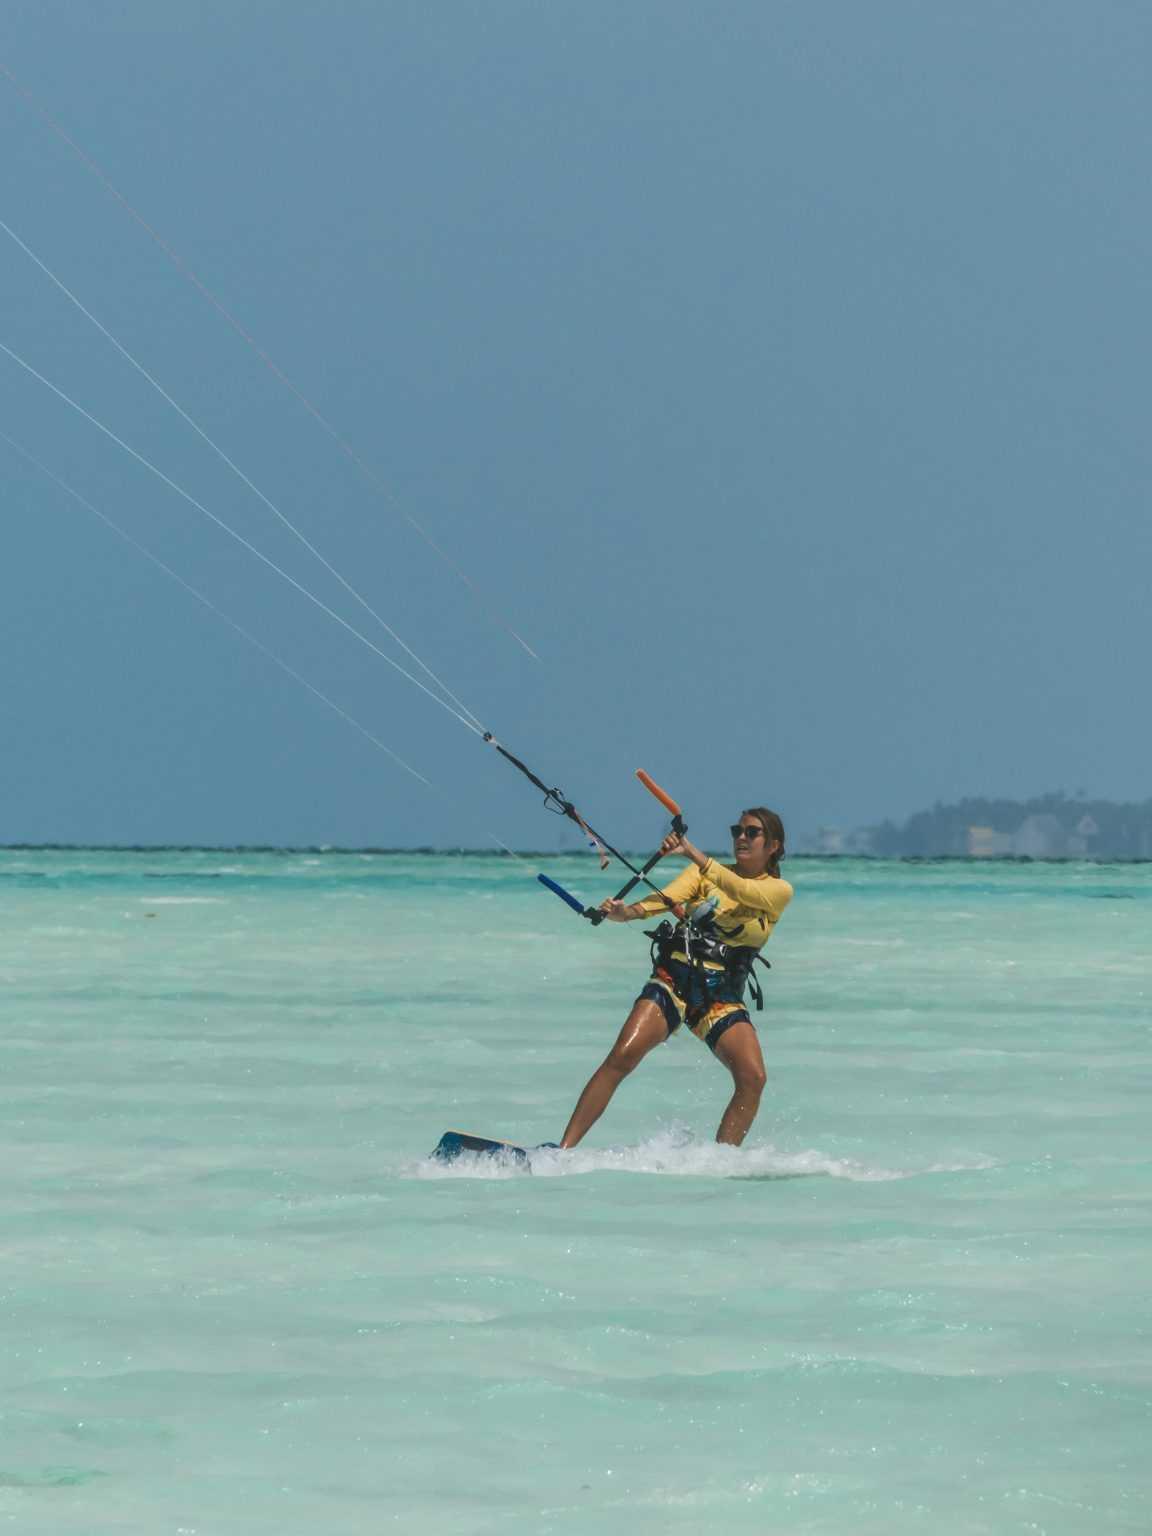 Manon déjà vice-championne de KiteSurf